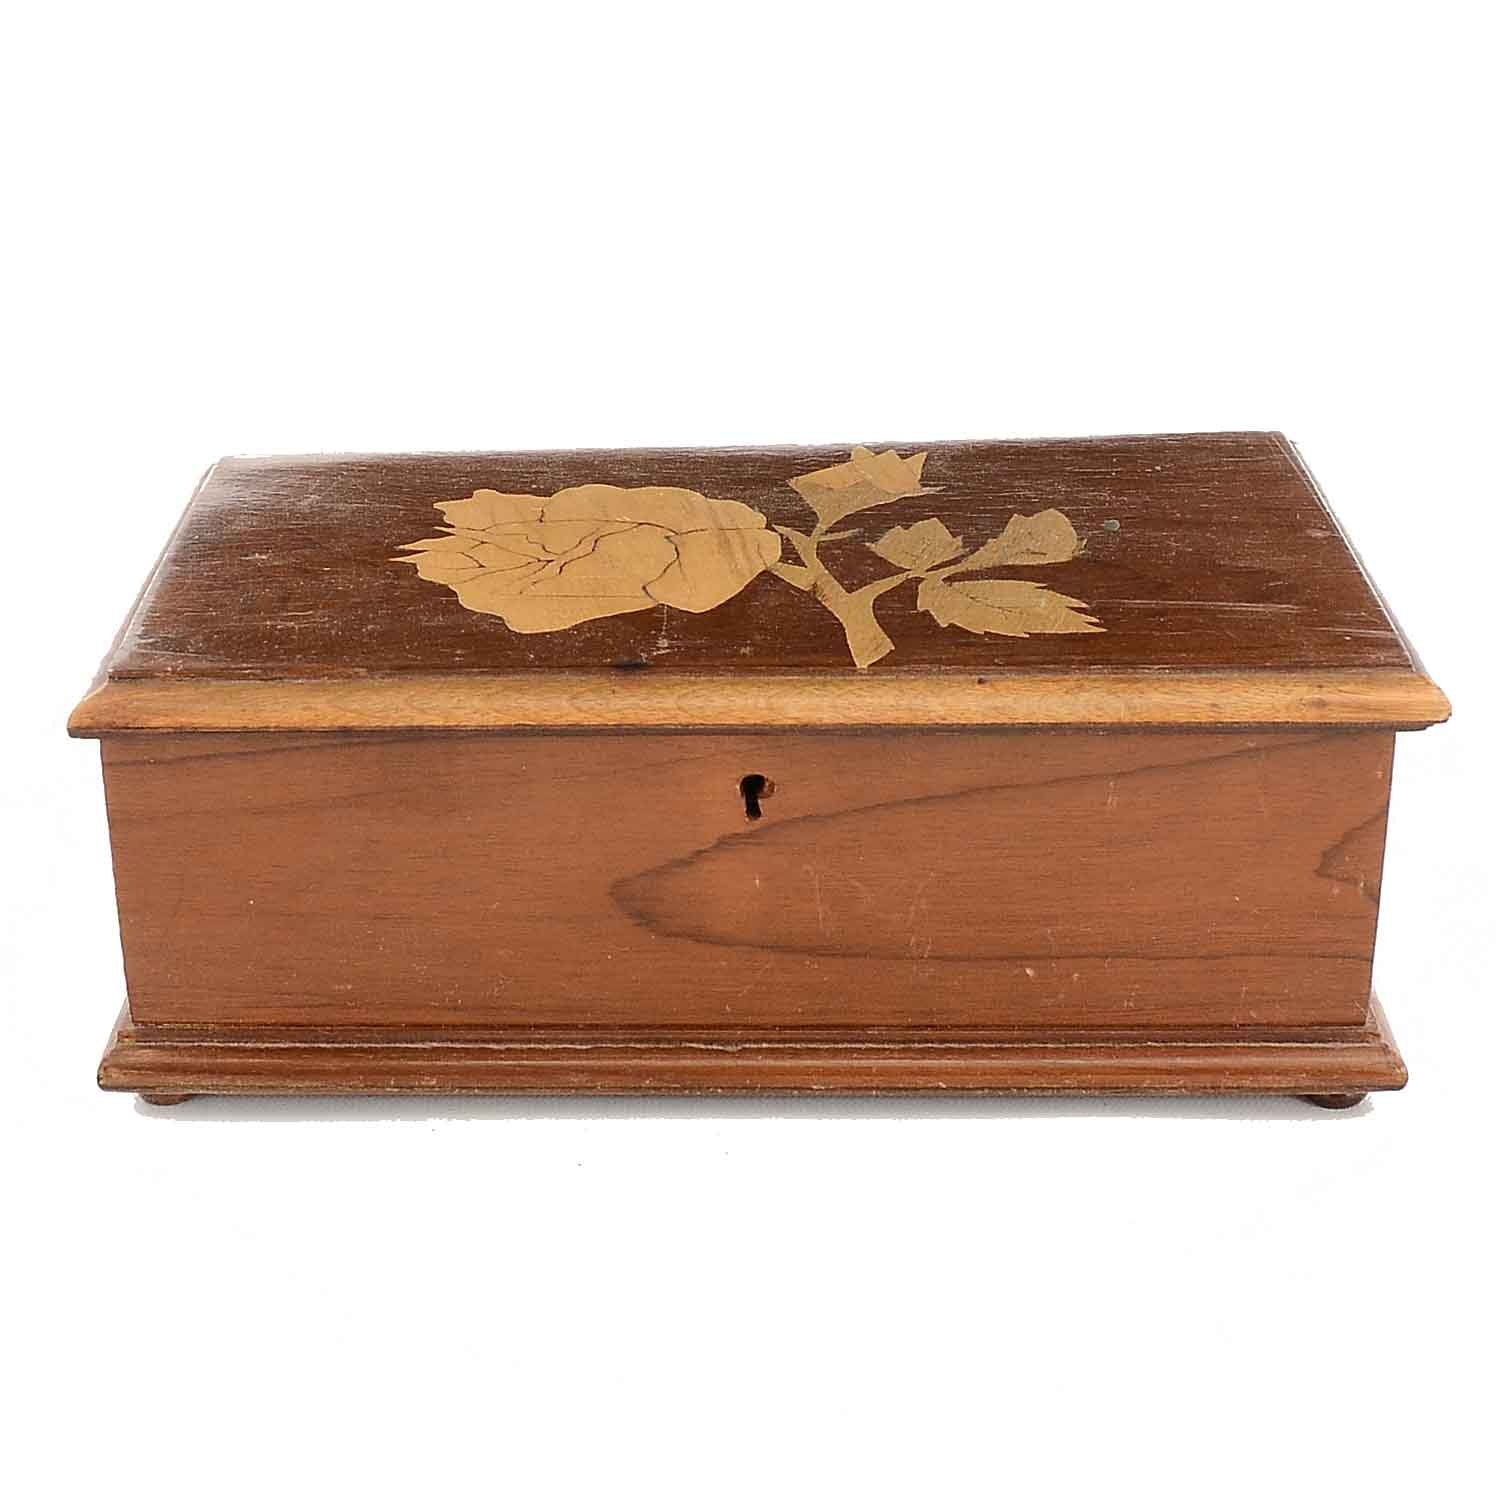 Rose Inlaid Walnut Jewelry Box